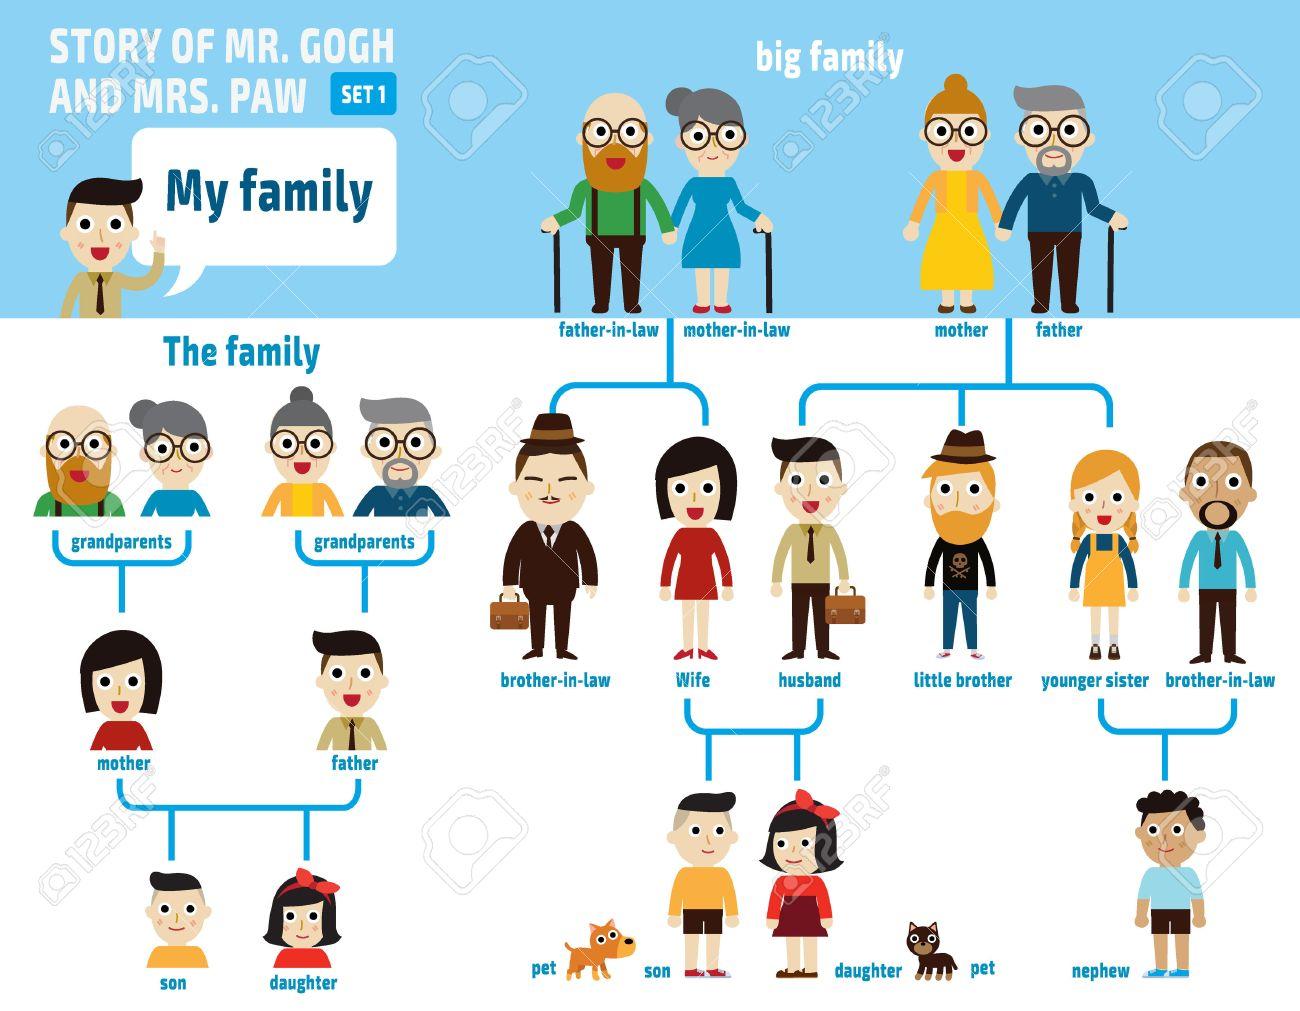 big family cartoon.infographic elements. - 52533677